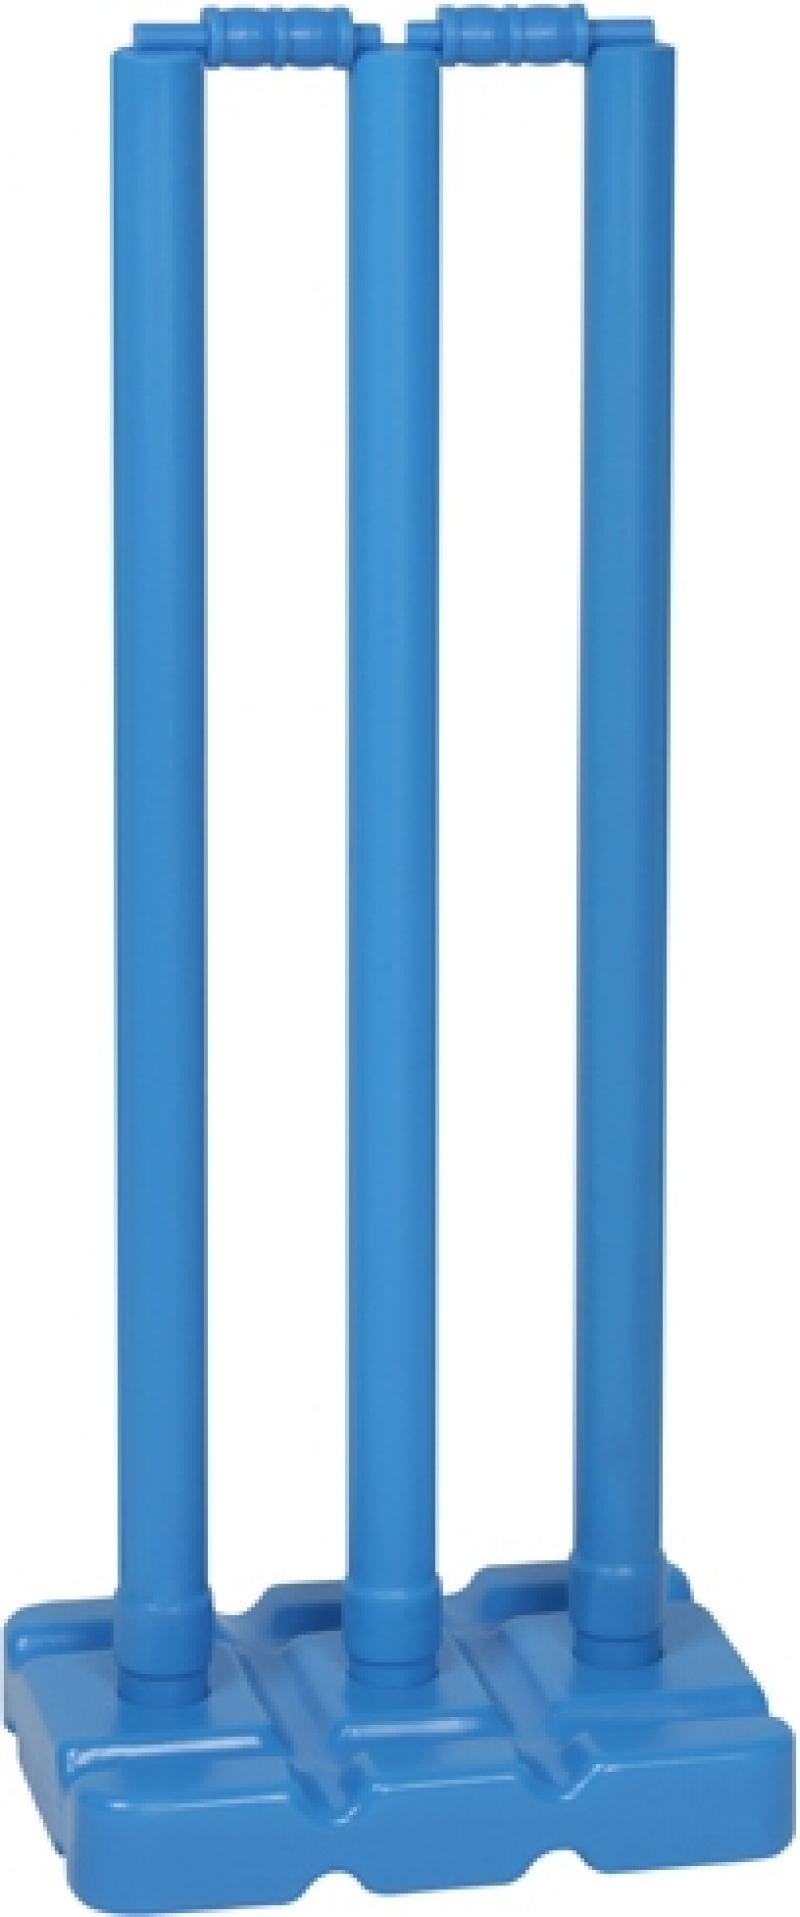 Kwik Cricket Stump Set